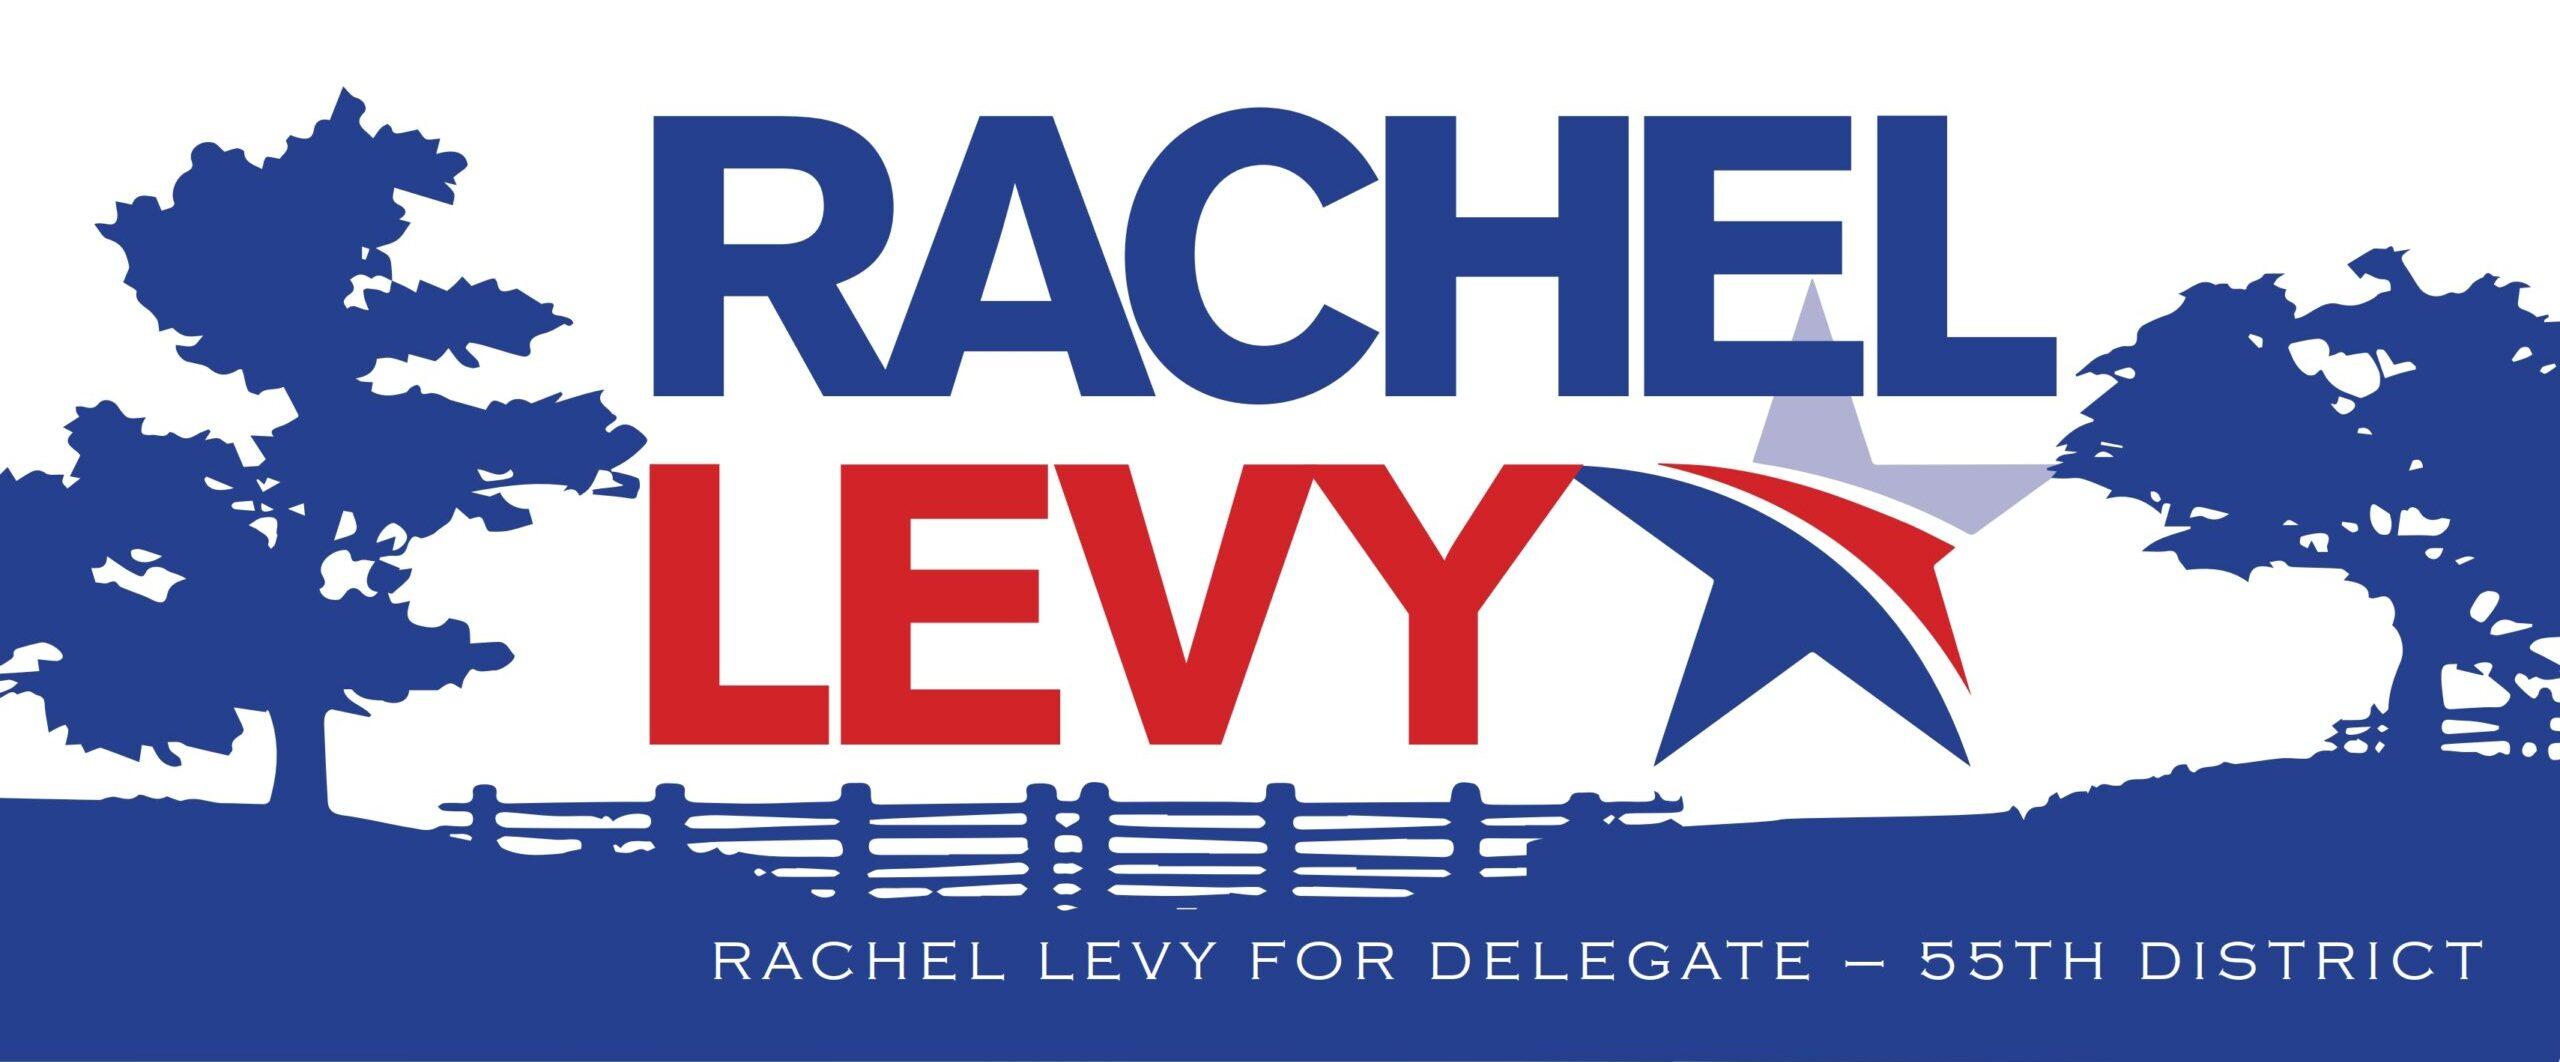 Rachel Levy for Delegate